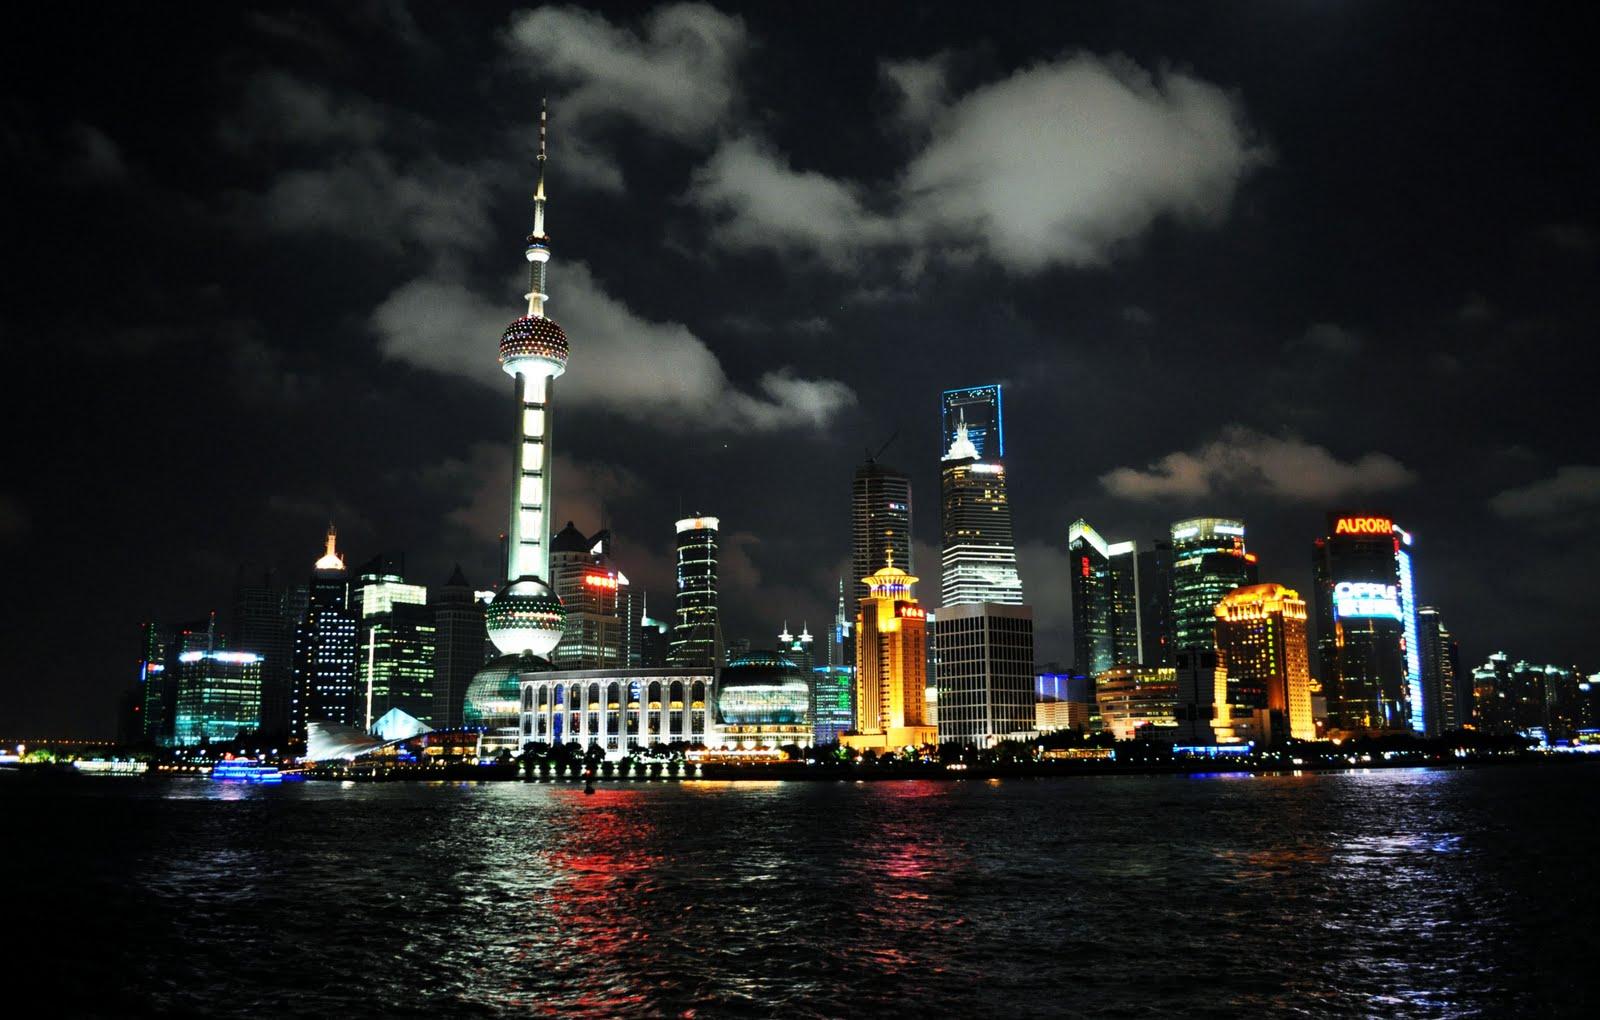 http://1.bp.blogspot.com/__DpNWq5zK0Q/TIkwNV0QodI/AAAAAAAAA1Y/R7WXkspcEOI/s1600/shanghai+night.jpg